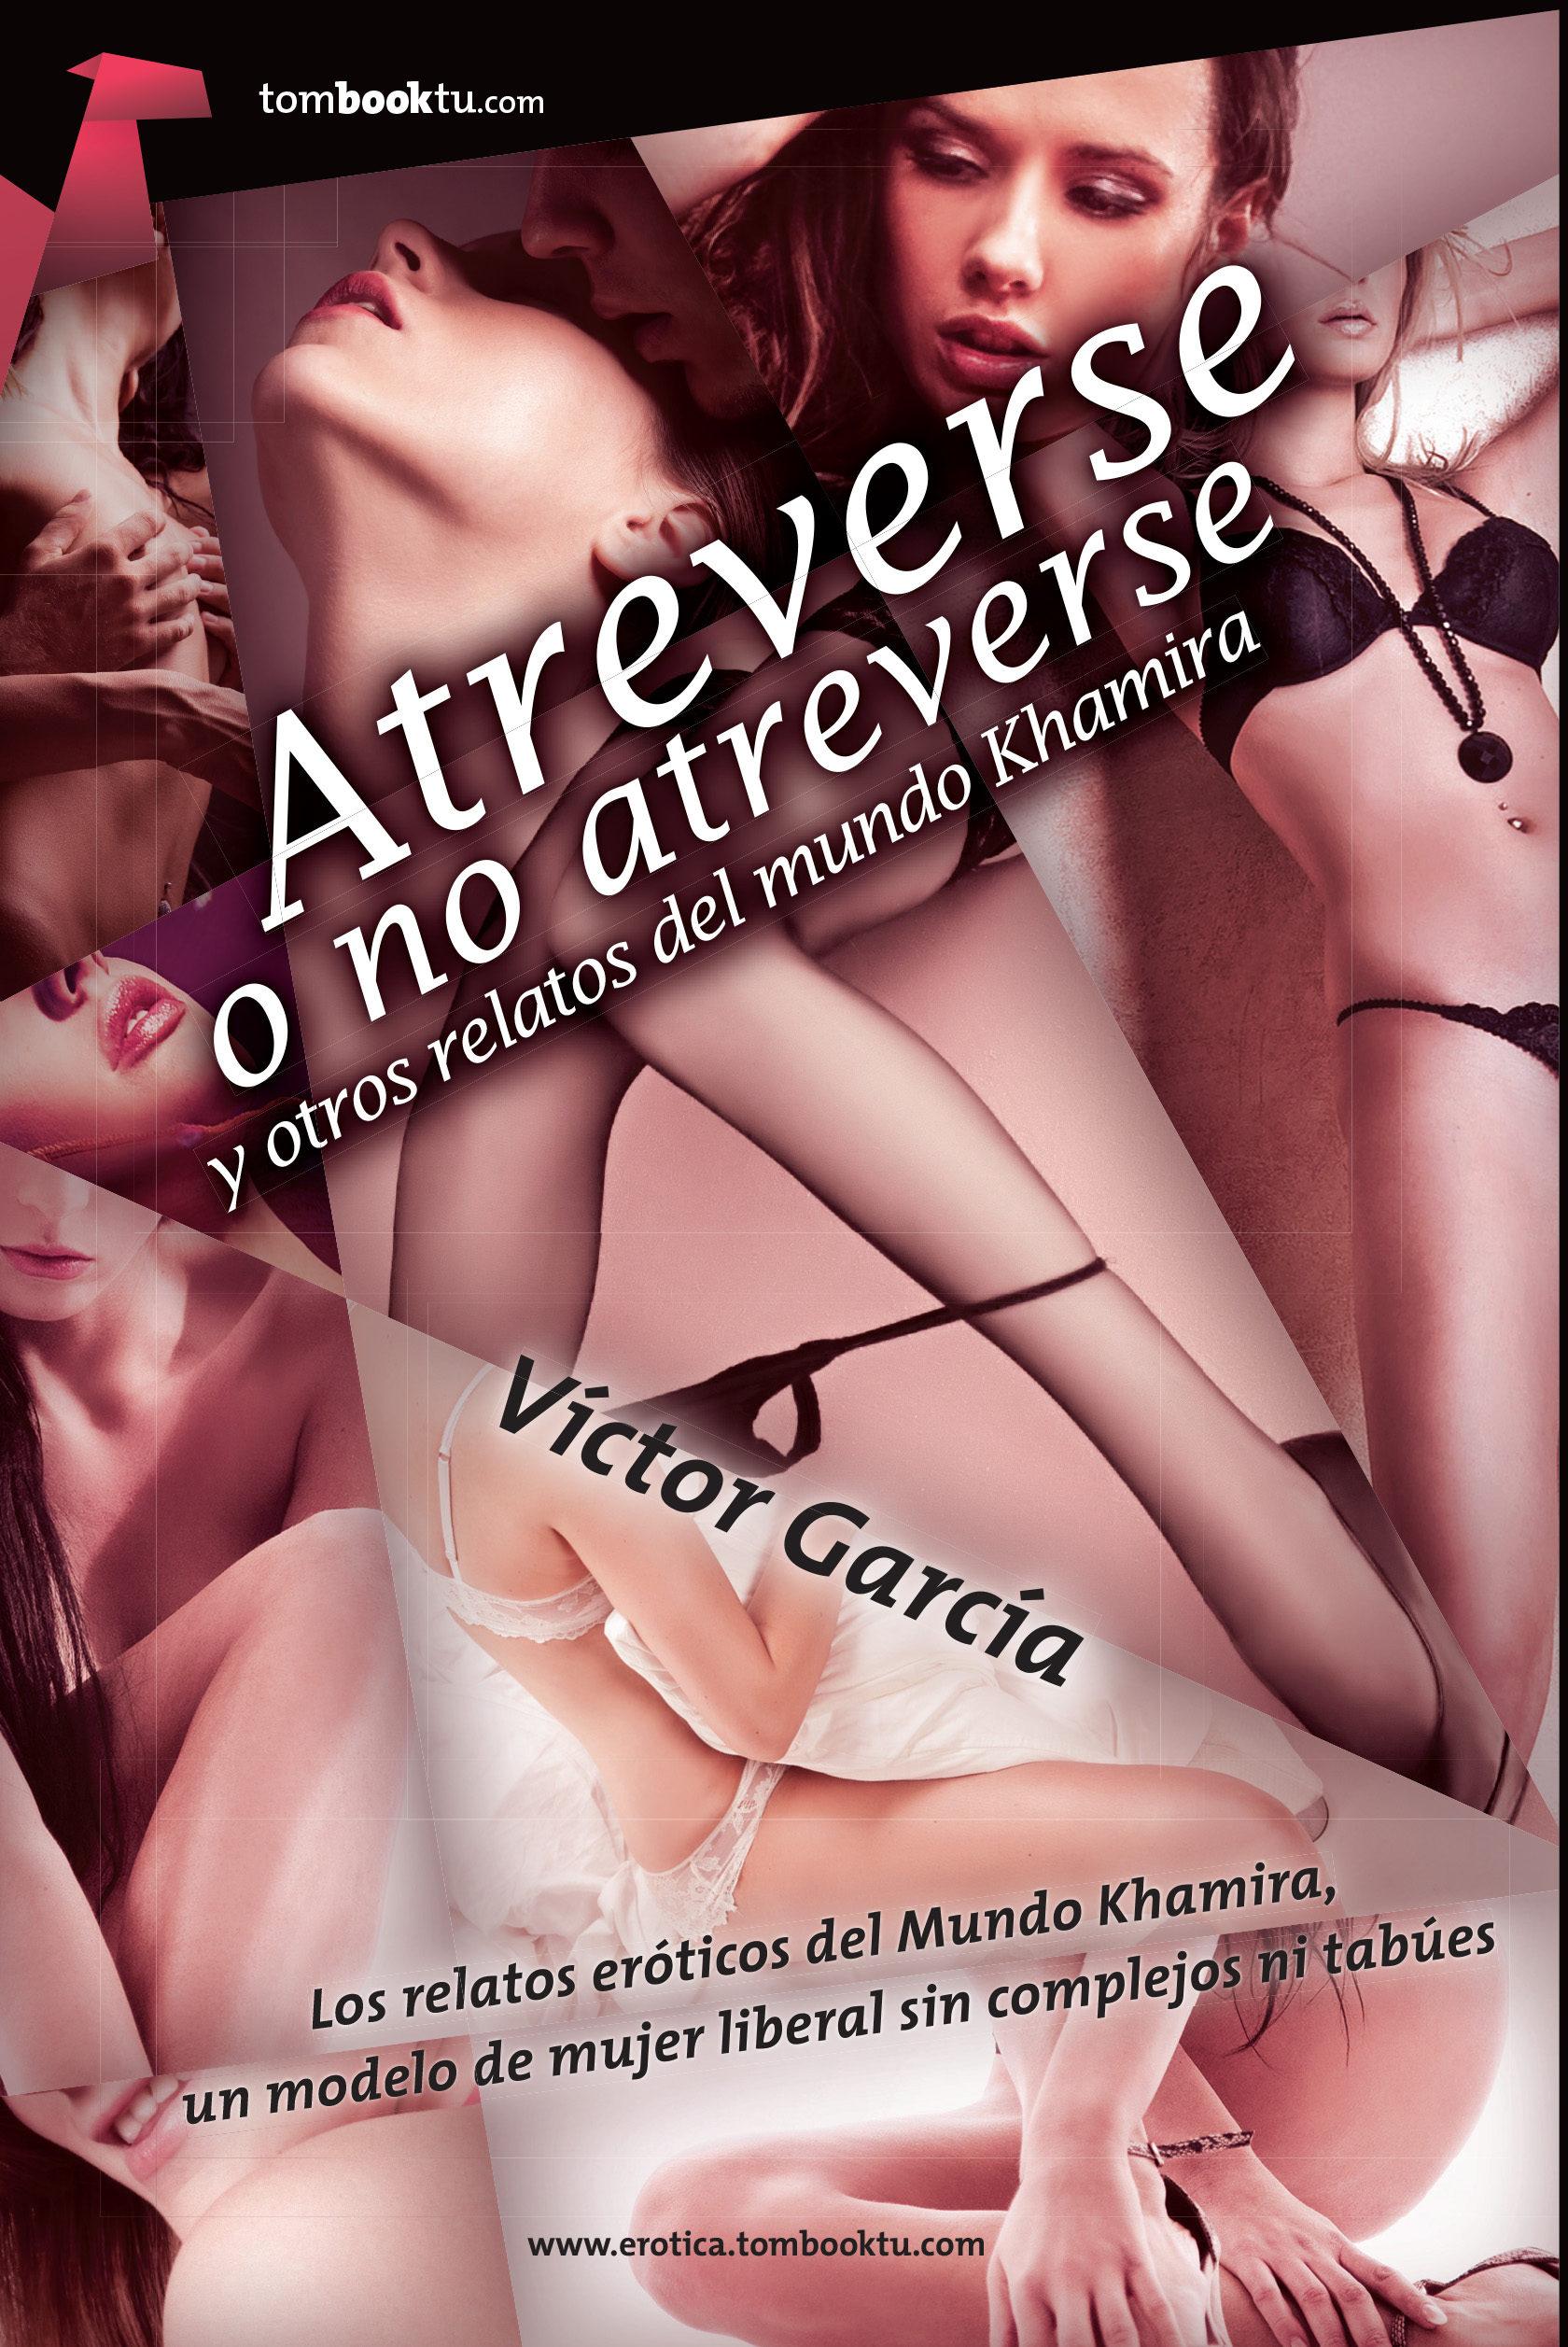 Atreverse O No Atreverse Victor Garcia Barco 9788415747437